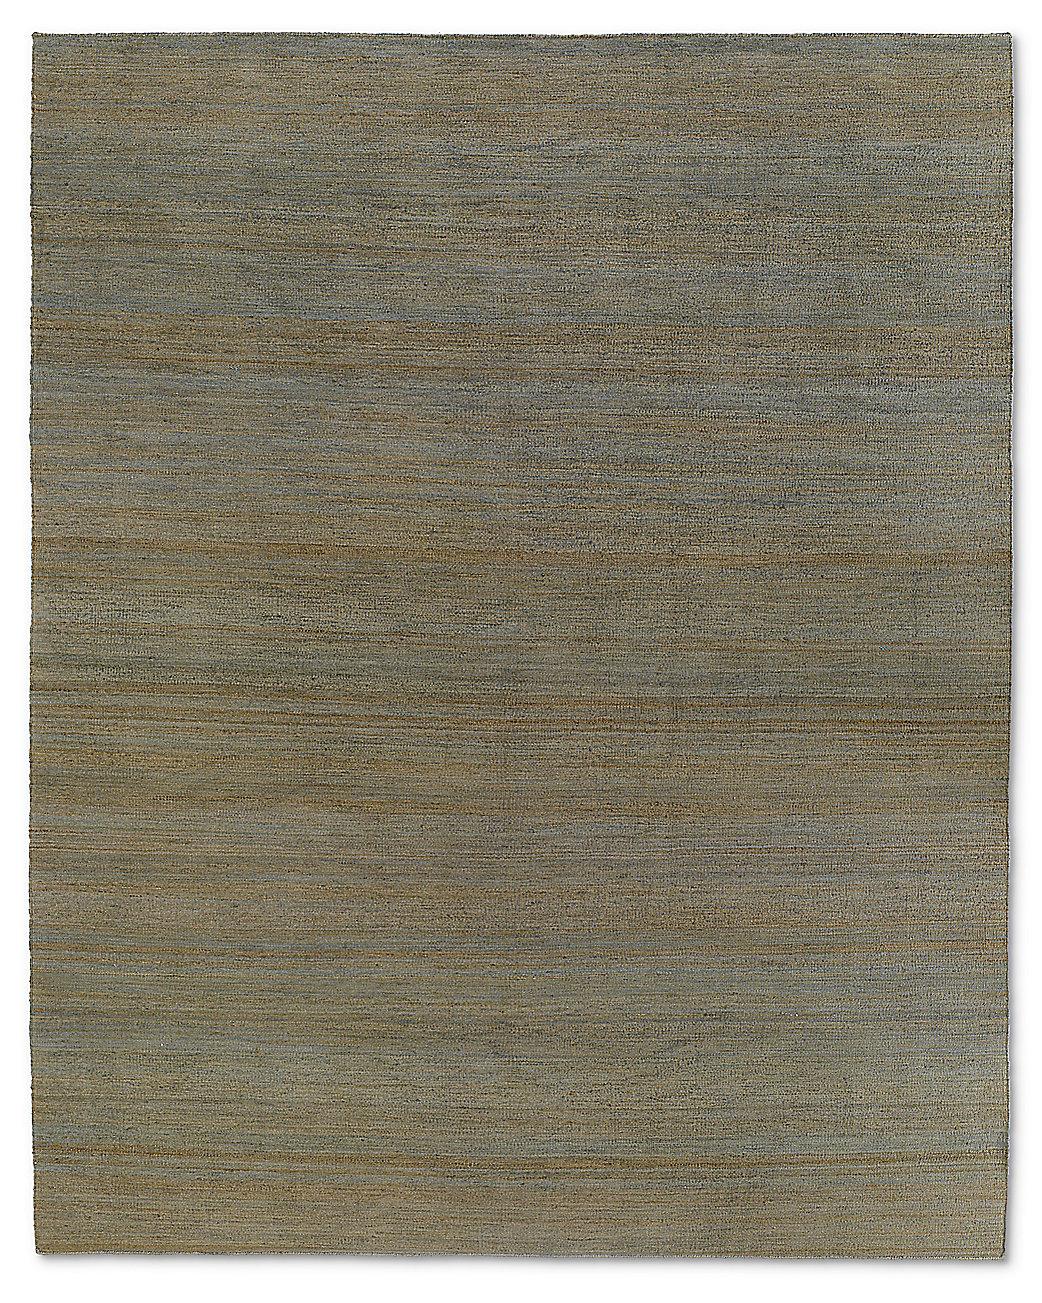 Flatweave solid rug grey for Restoration hardware rugs on sale